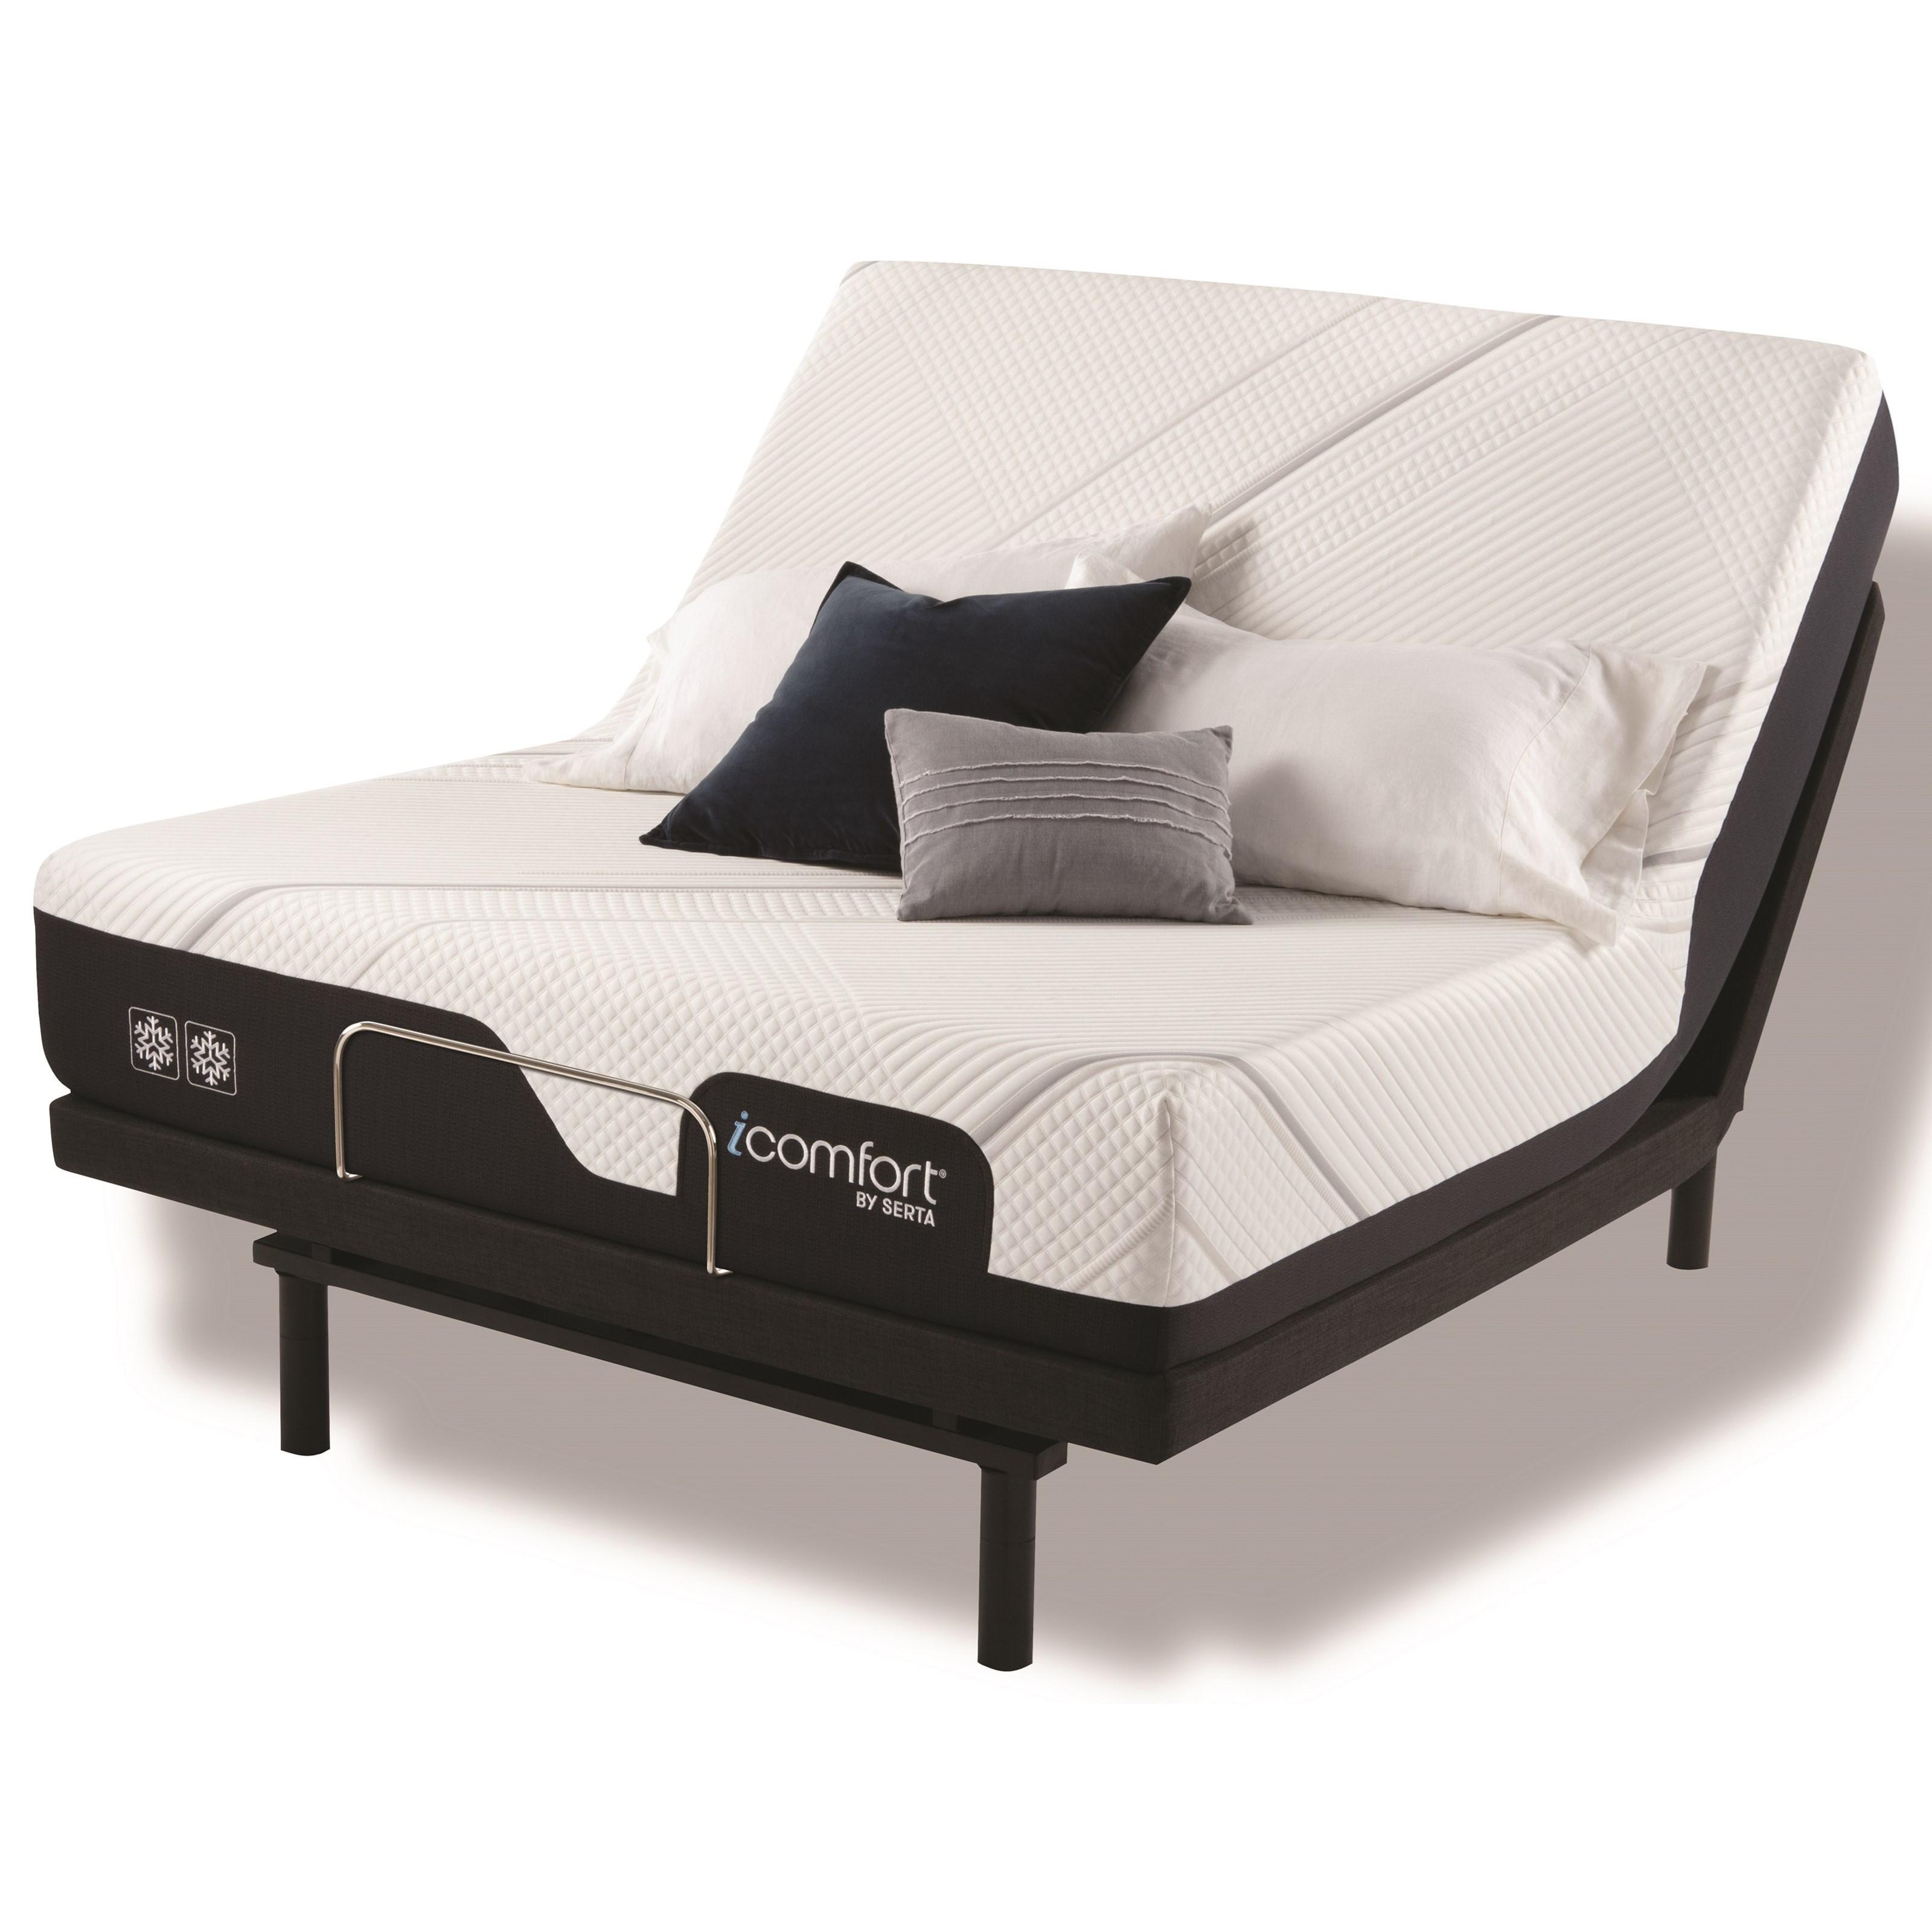 "iComfort CF2000 Firm Queen 11 1/2"" Firm Memory Foam Adj Set by Serta at HomeWorld Furniture"